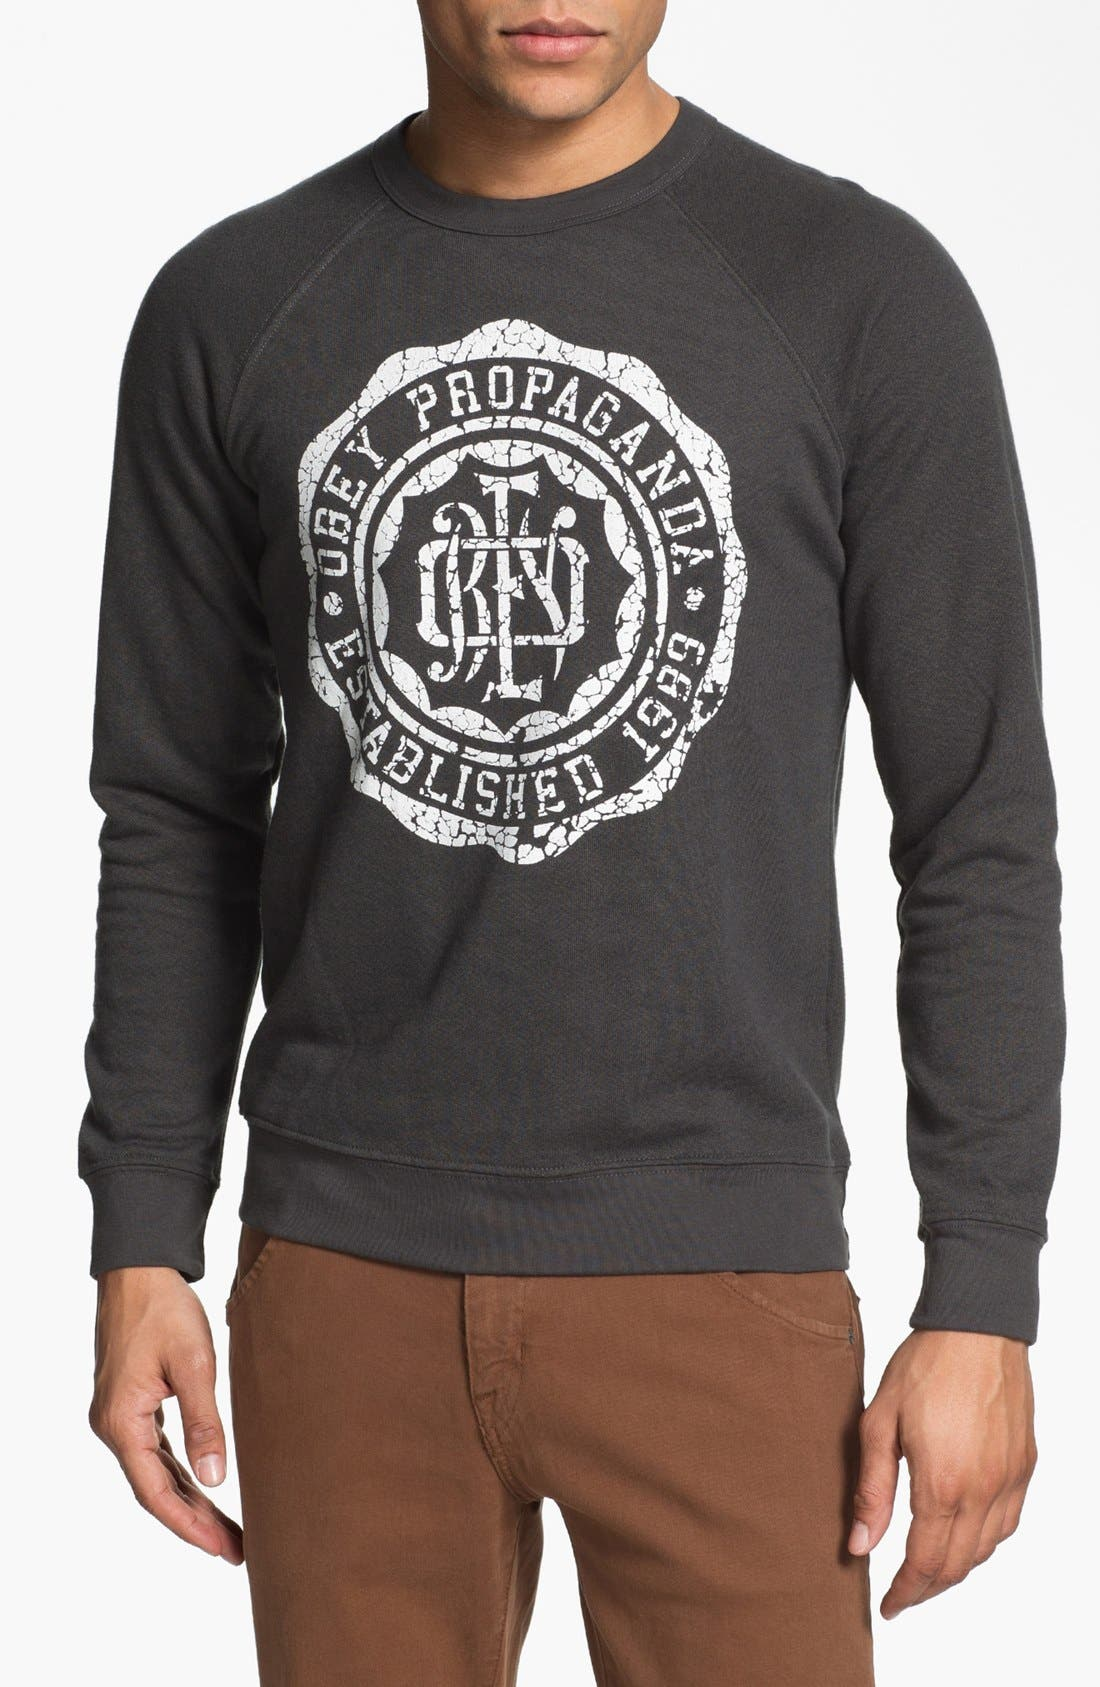 Main Image - Obey 'College Crest' Graphic Crewneck Sweatshirt.